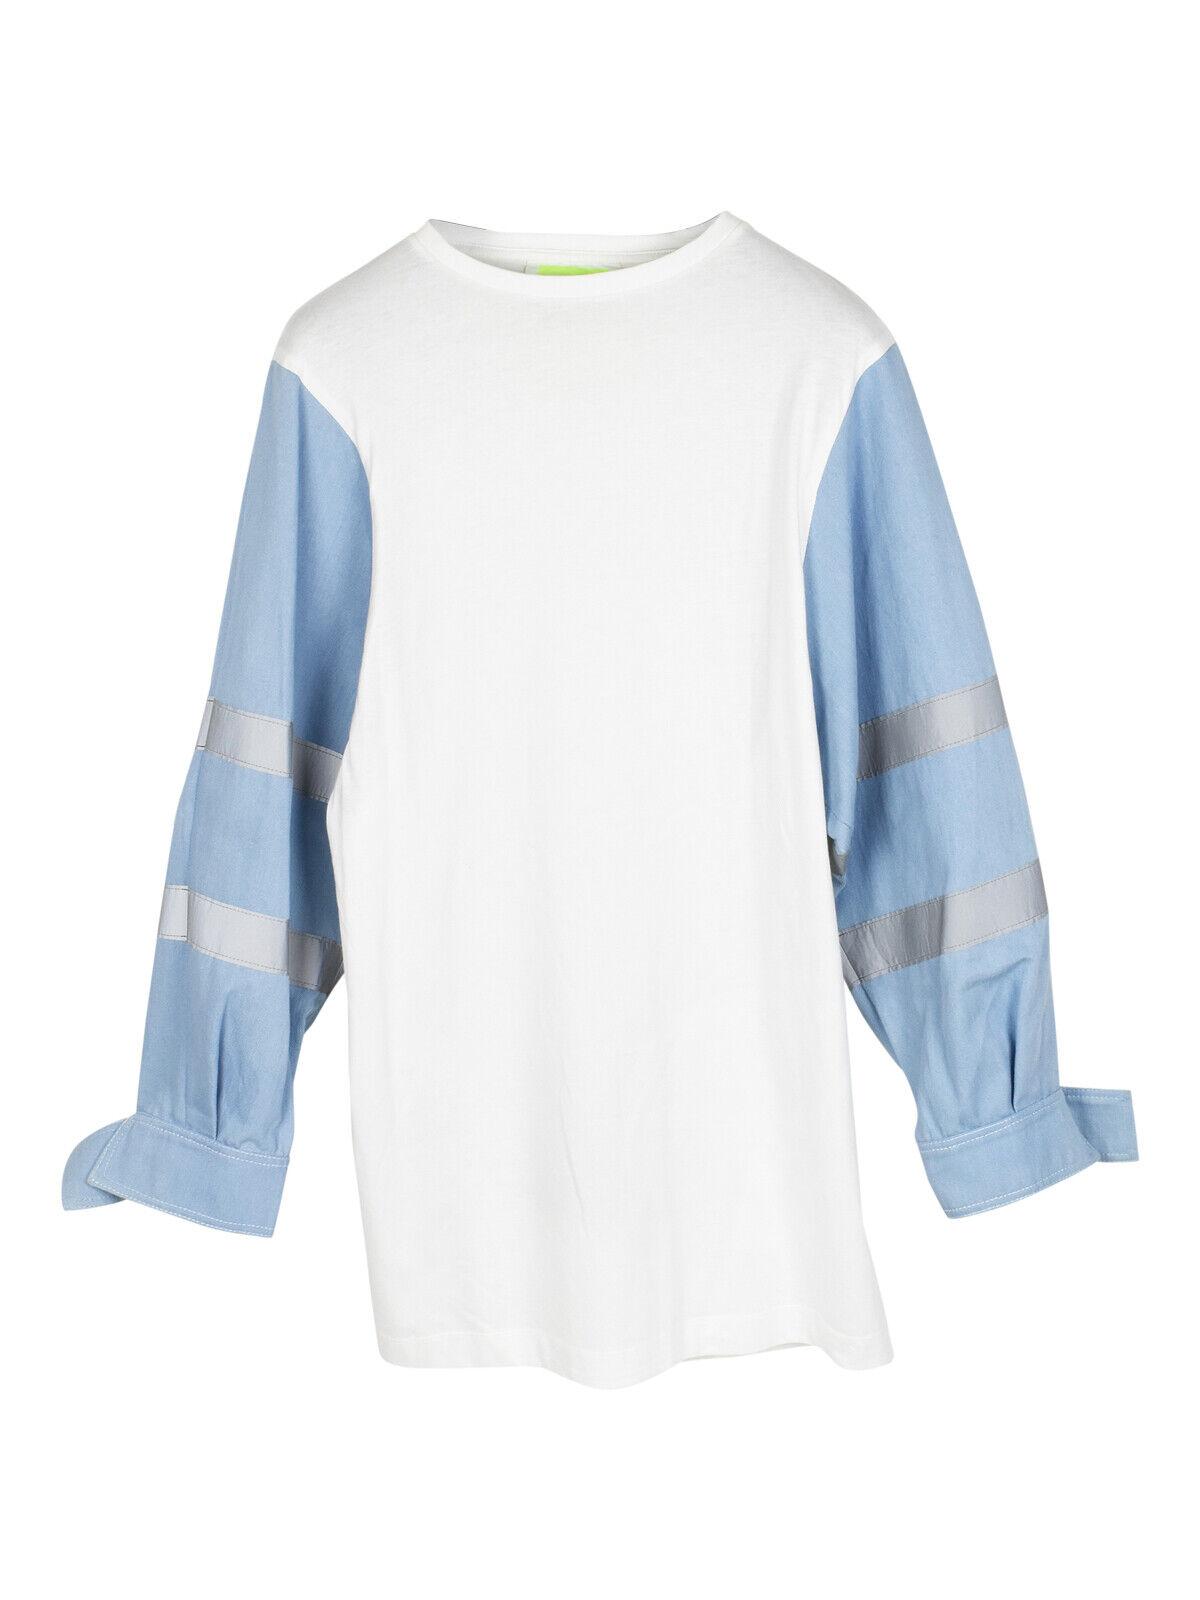 Fyodor Golan denim reflective sleeve oversized shirt